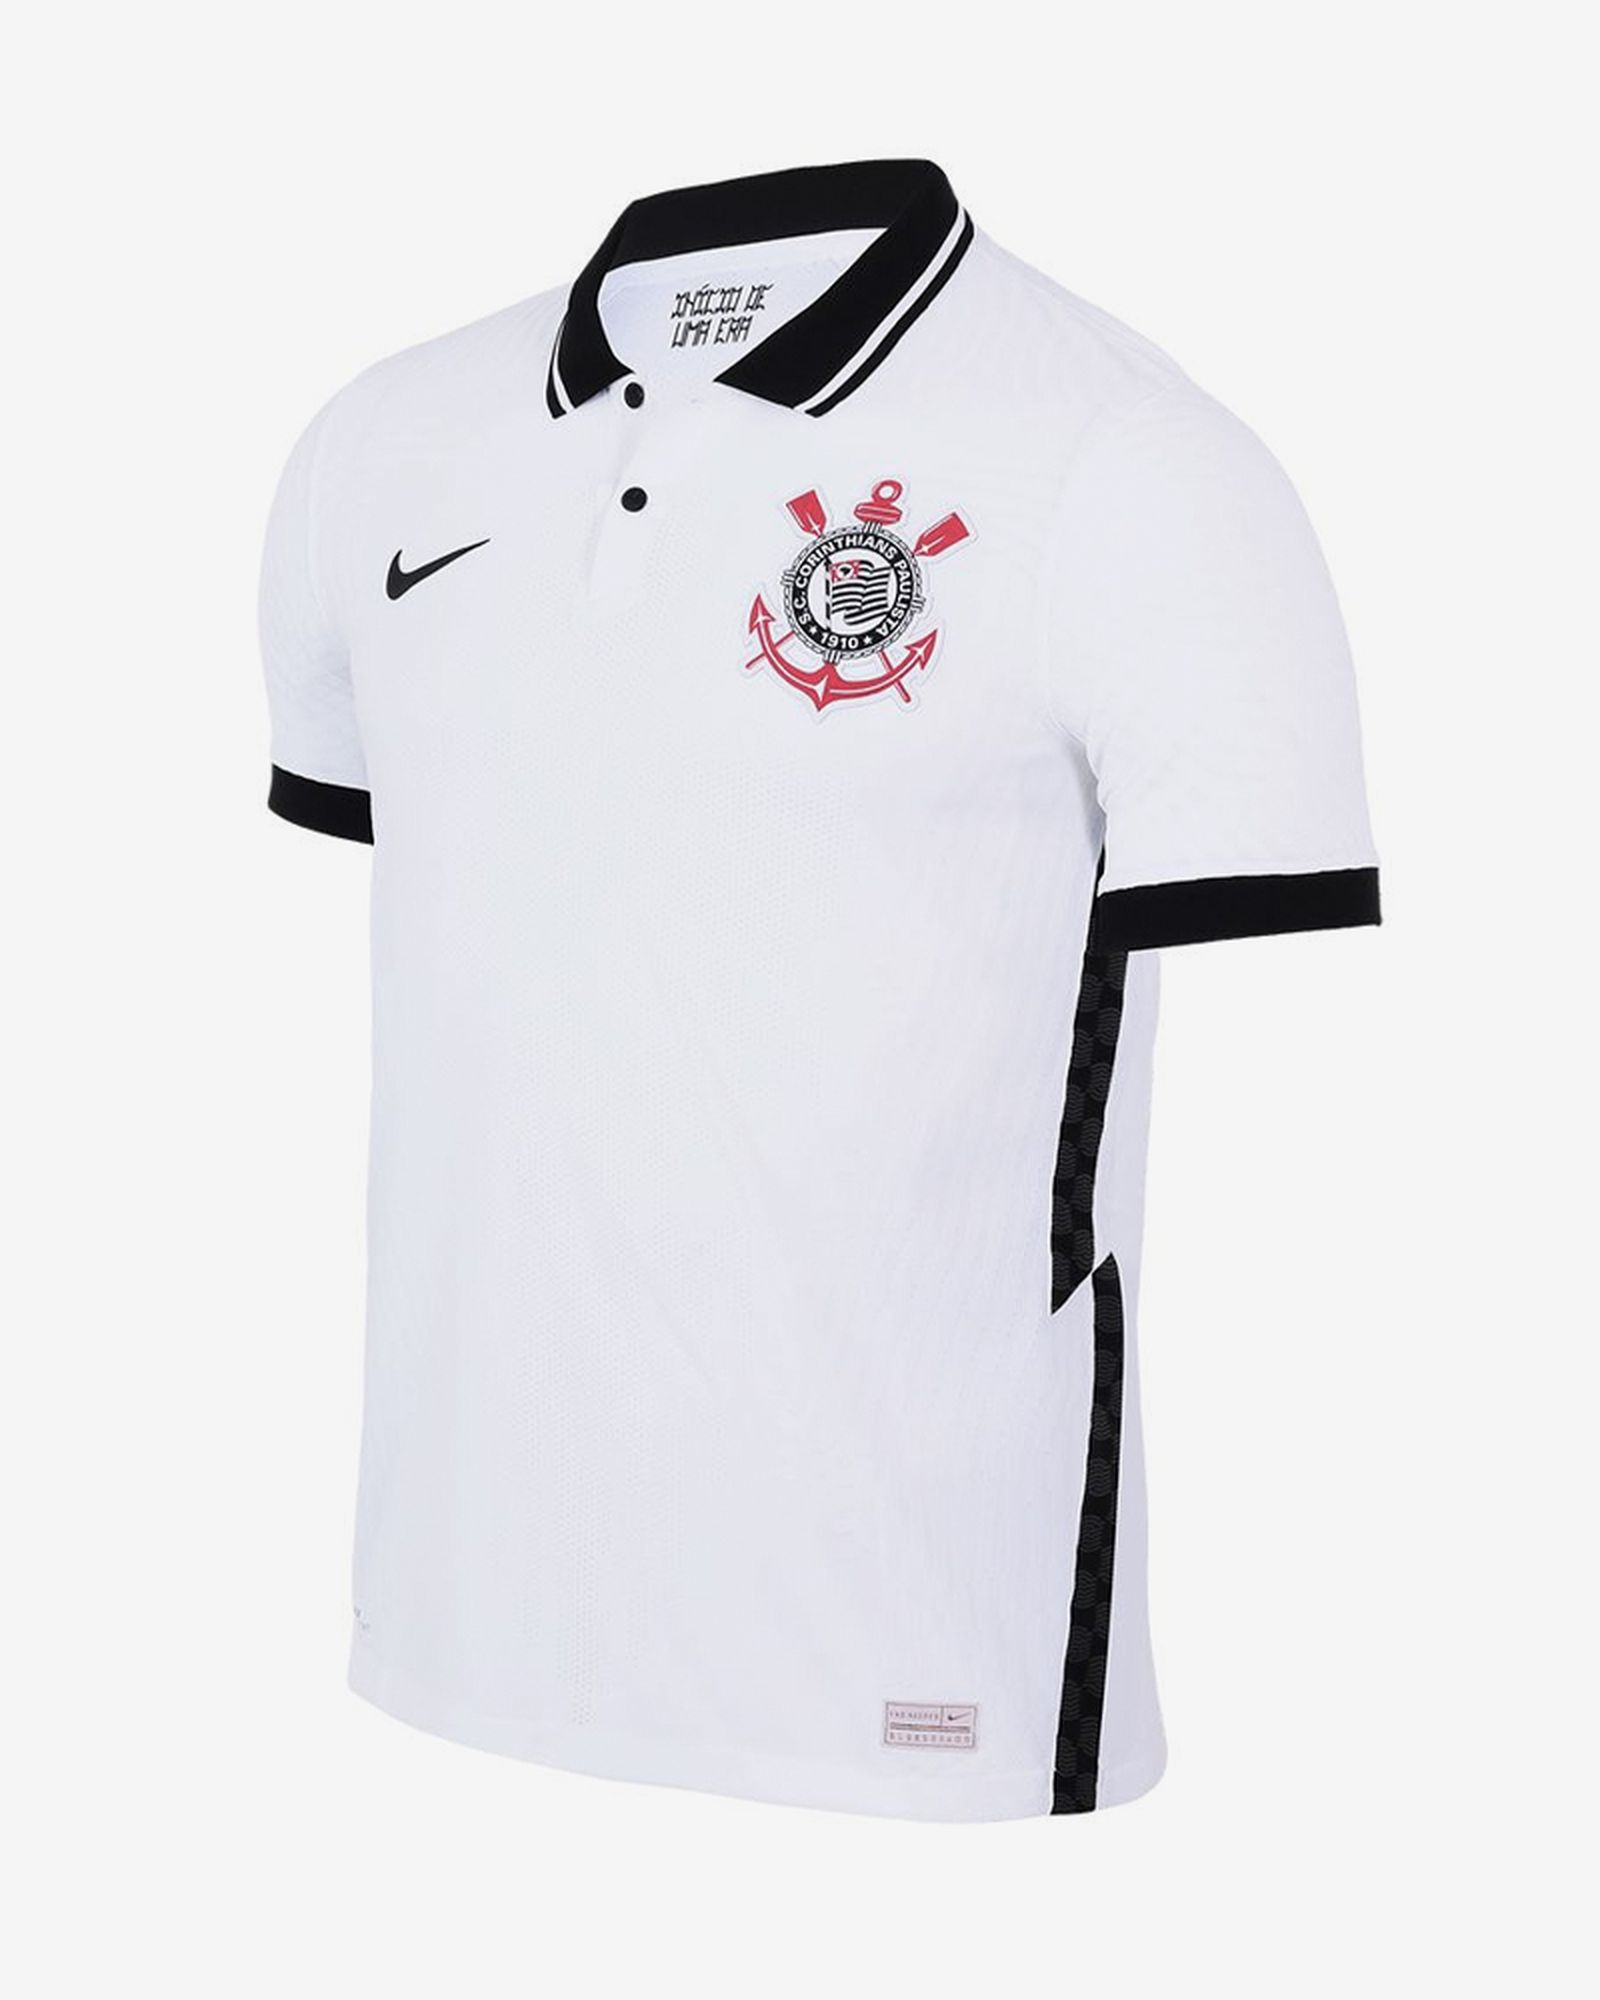 football-shirts-2020-review-19